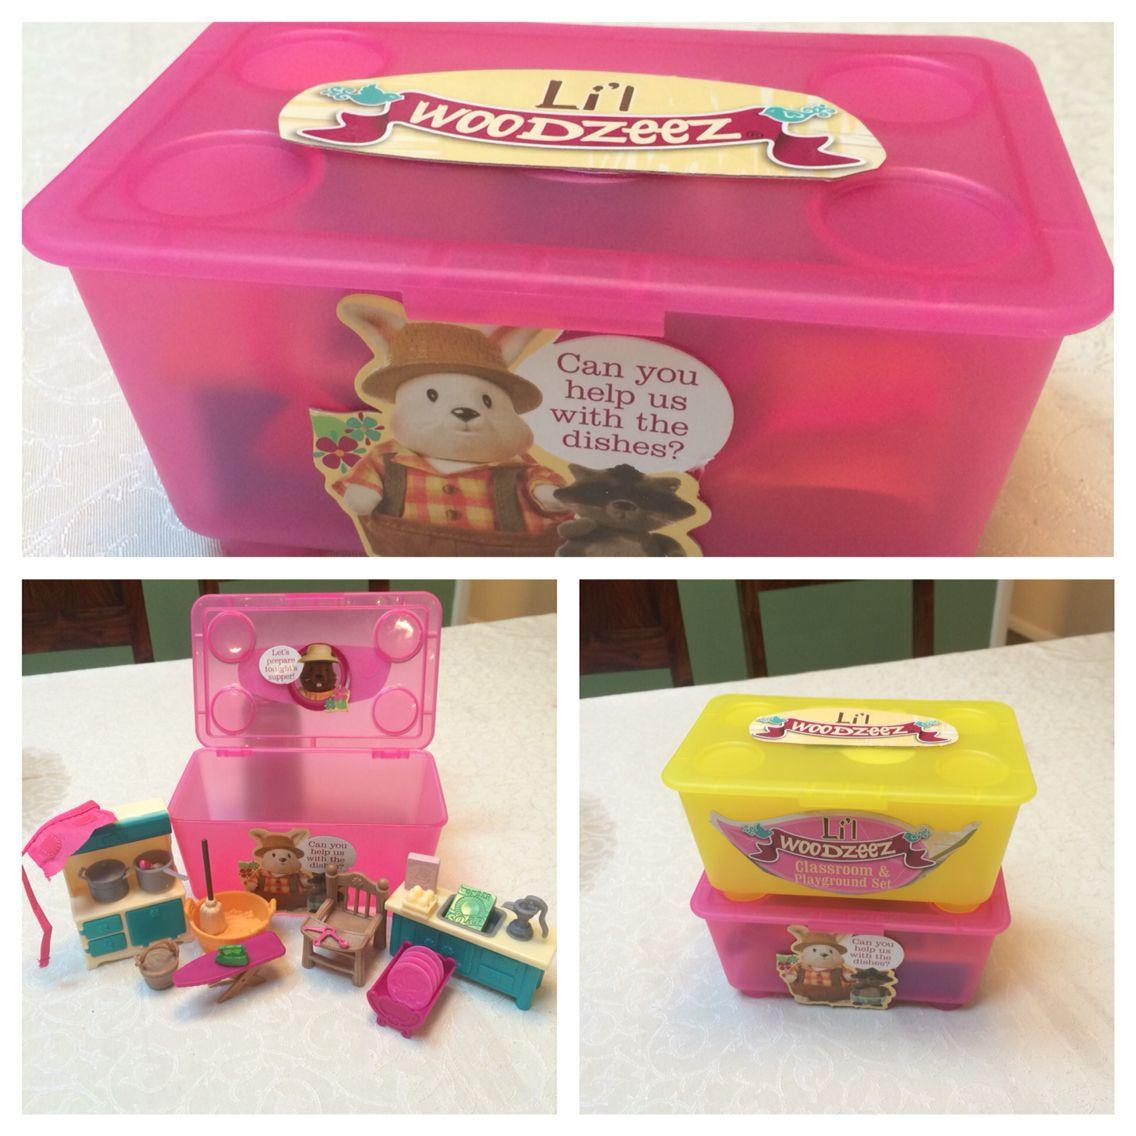 Childrens Kids Bedroom Furniture Set Toy Chest Boxes Ikea: Lil Woodzeez Storage. IKEA Hack. My Daughter Got Lil